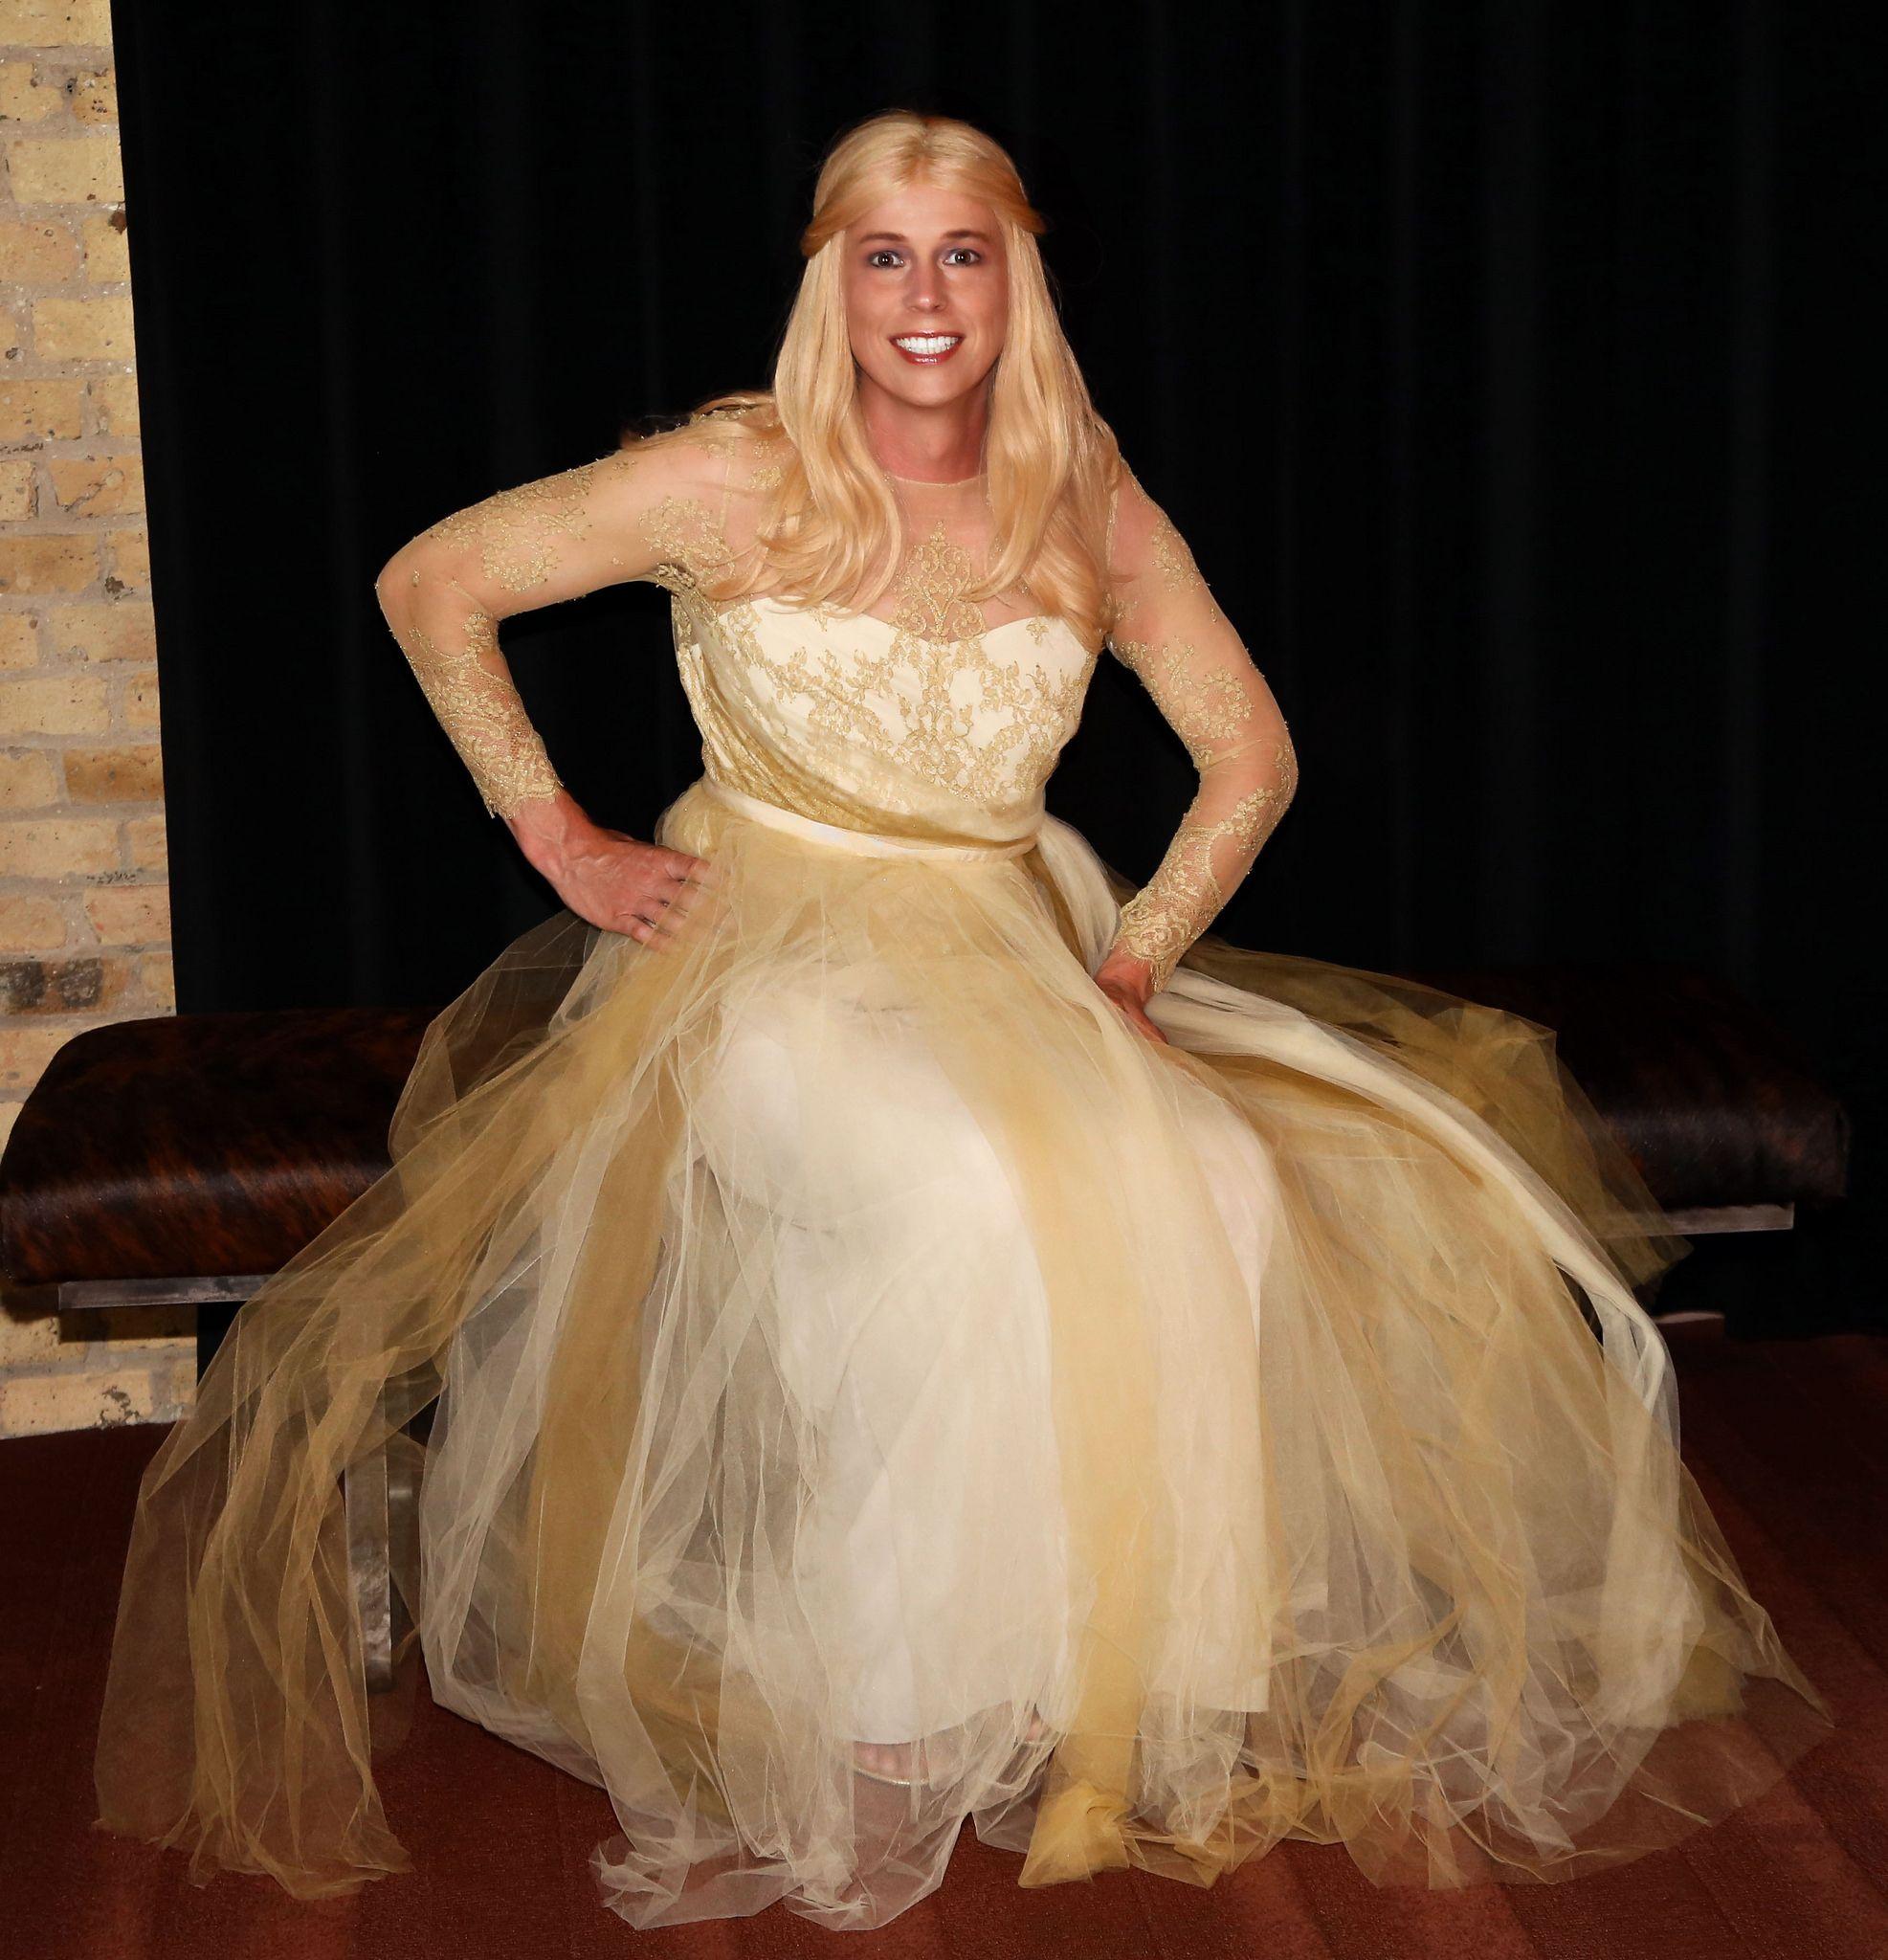 Crossdresser Bride